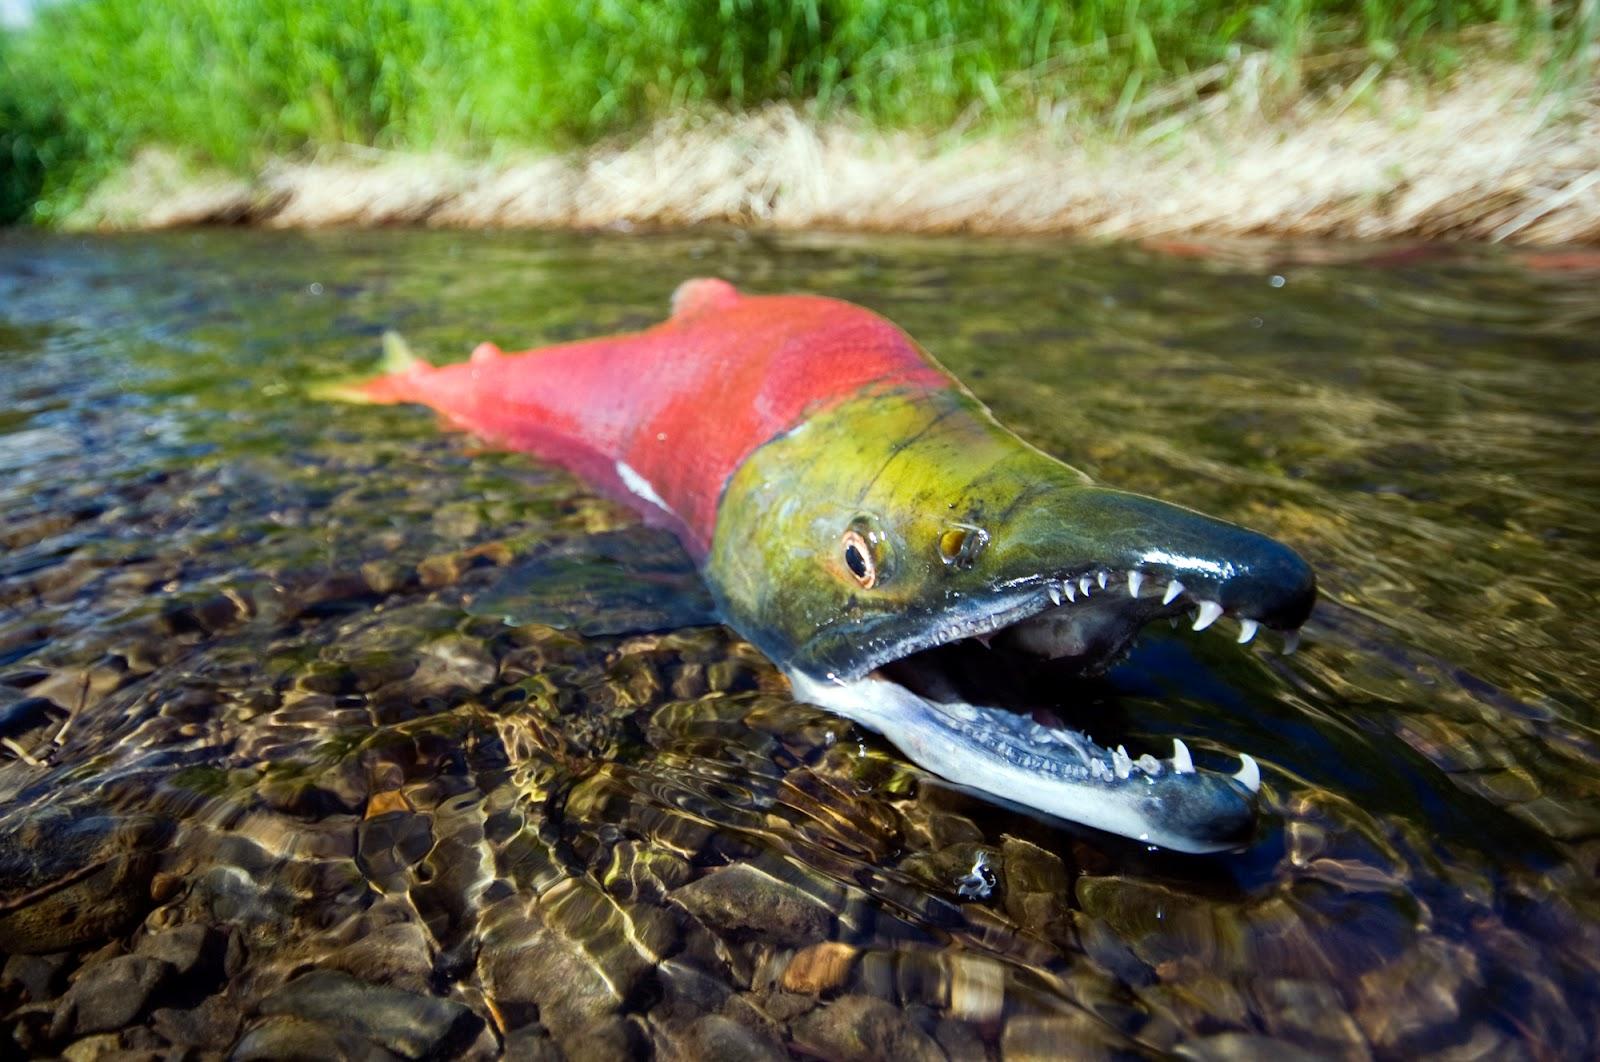 Sockeye salmon   The Life of Animals